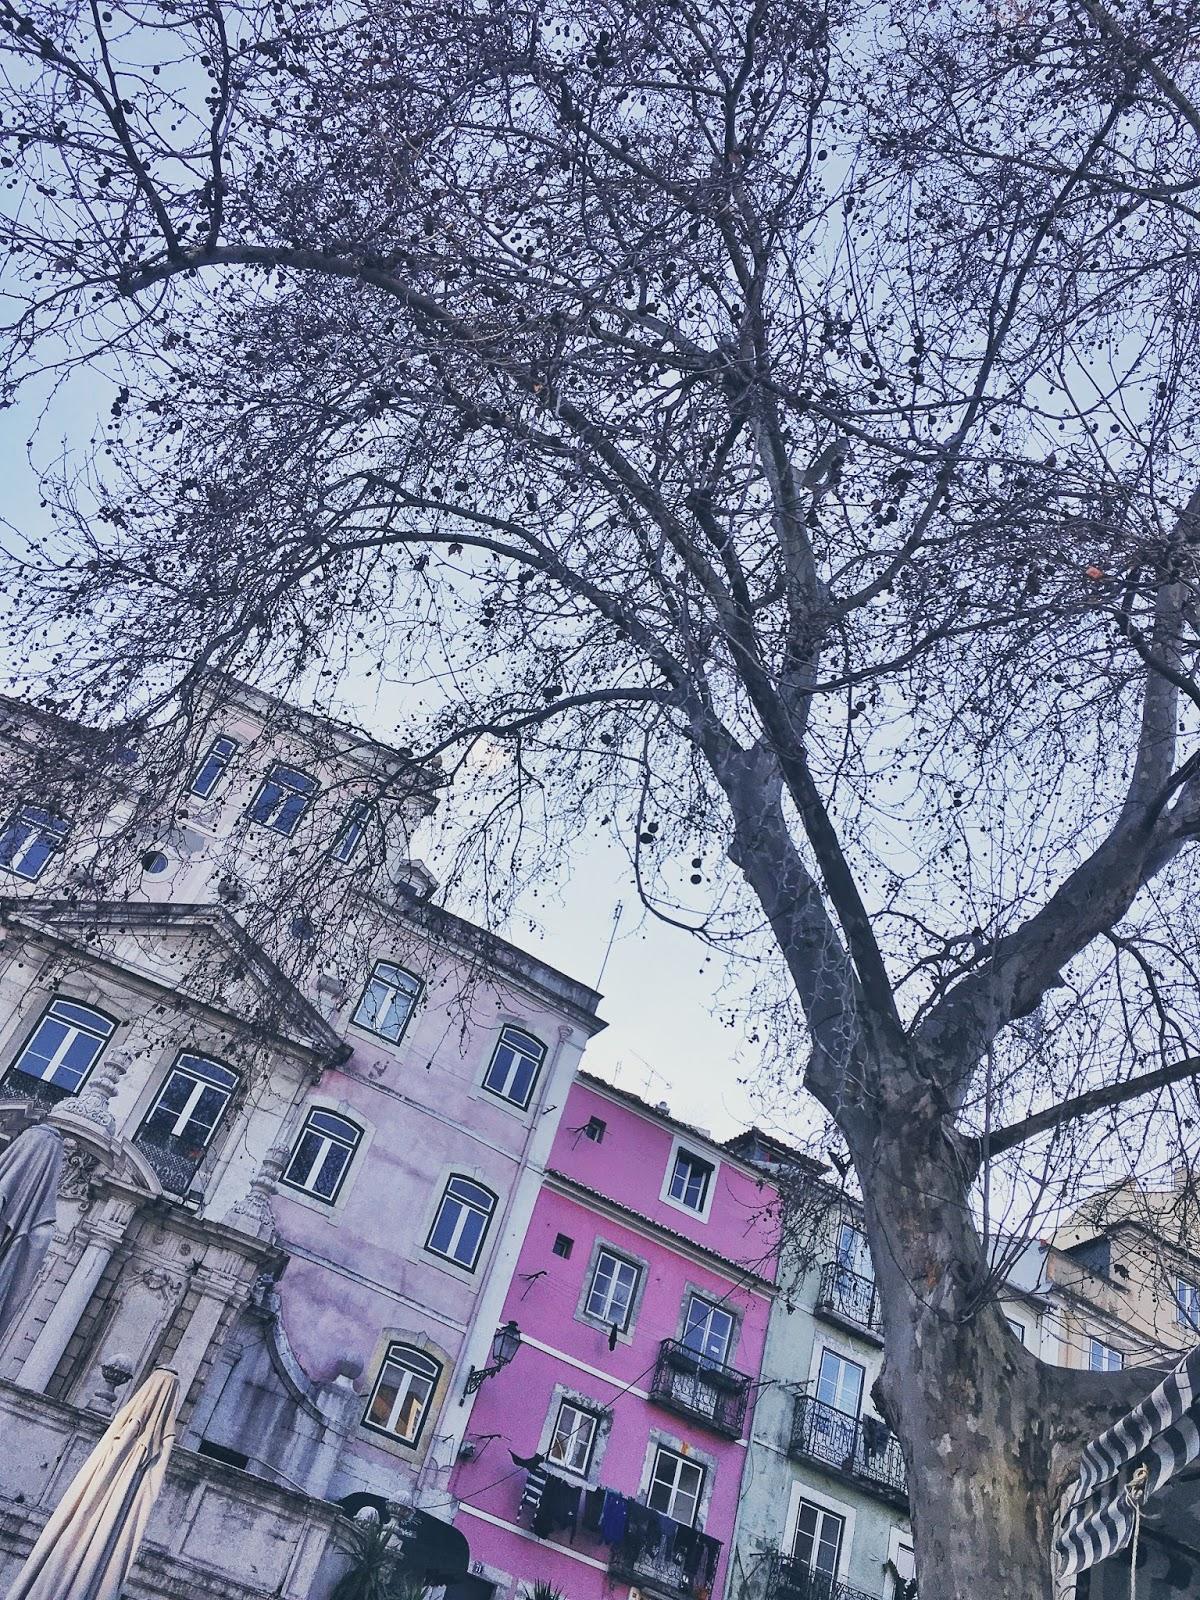 Lisabon, Lisbon, Portugal